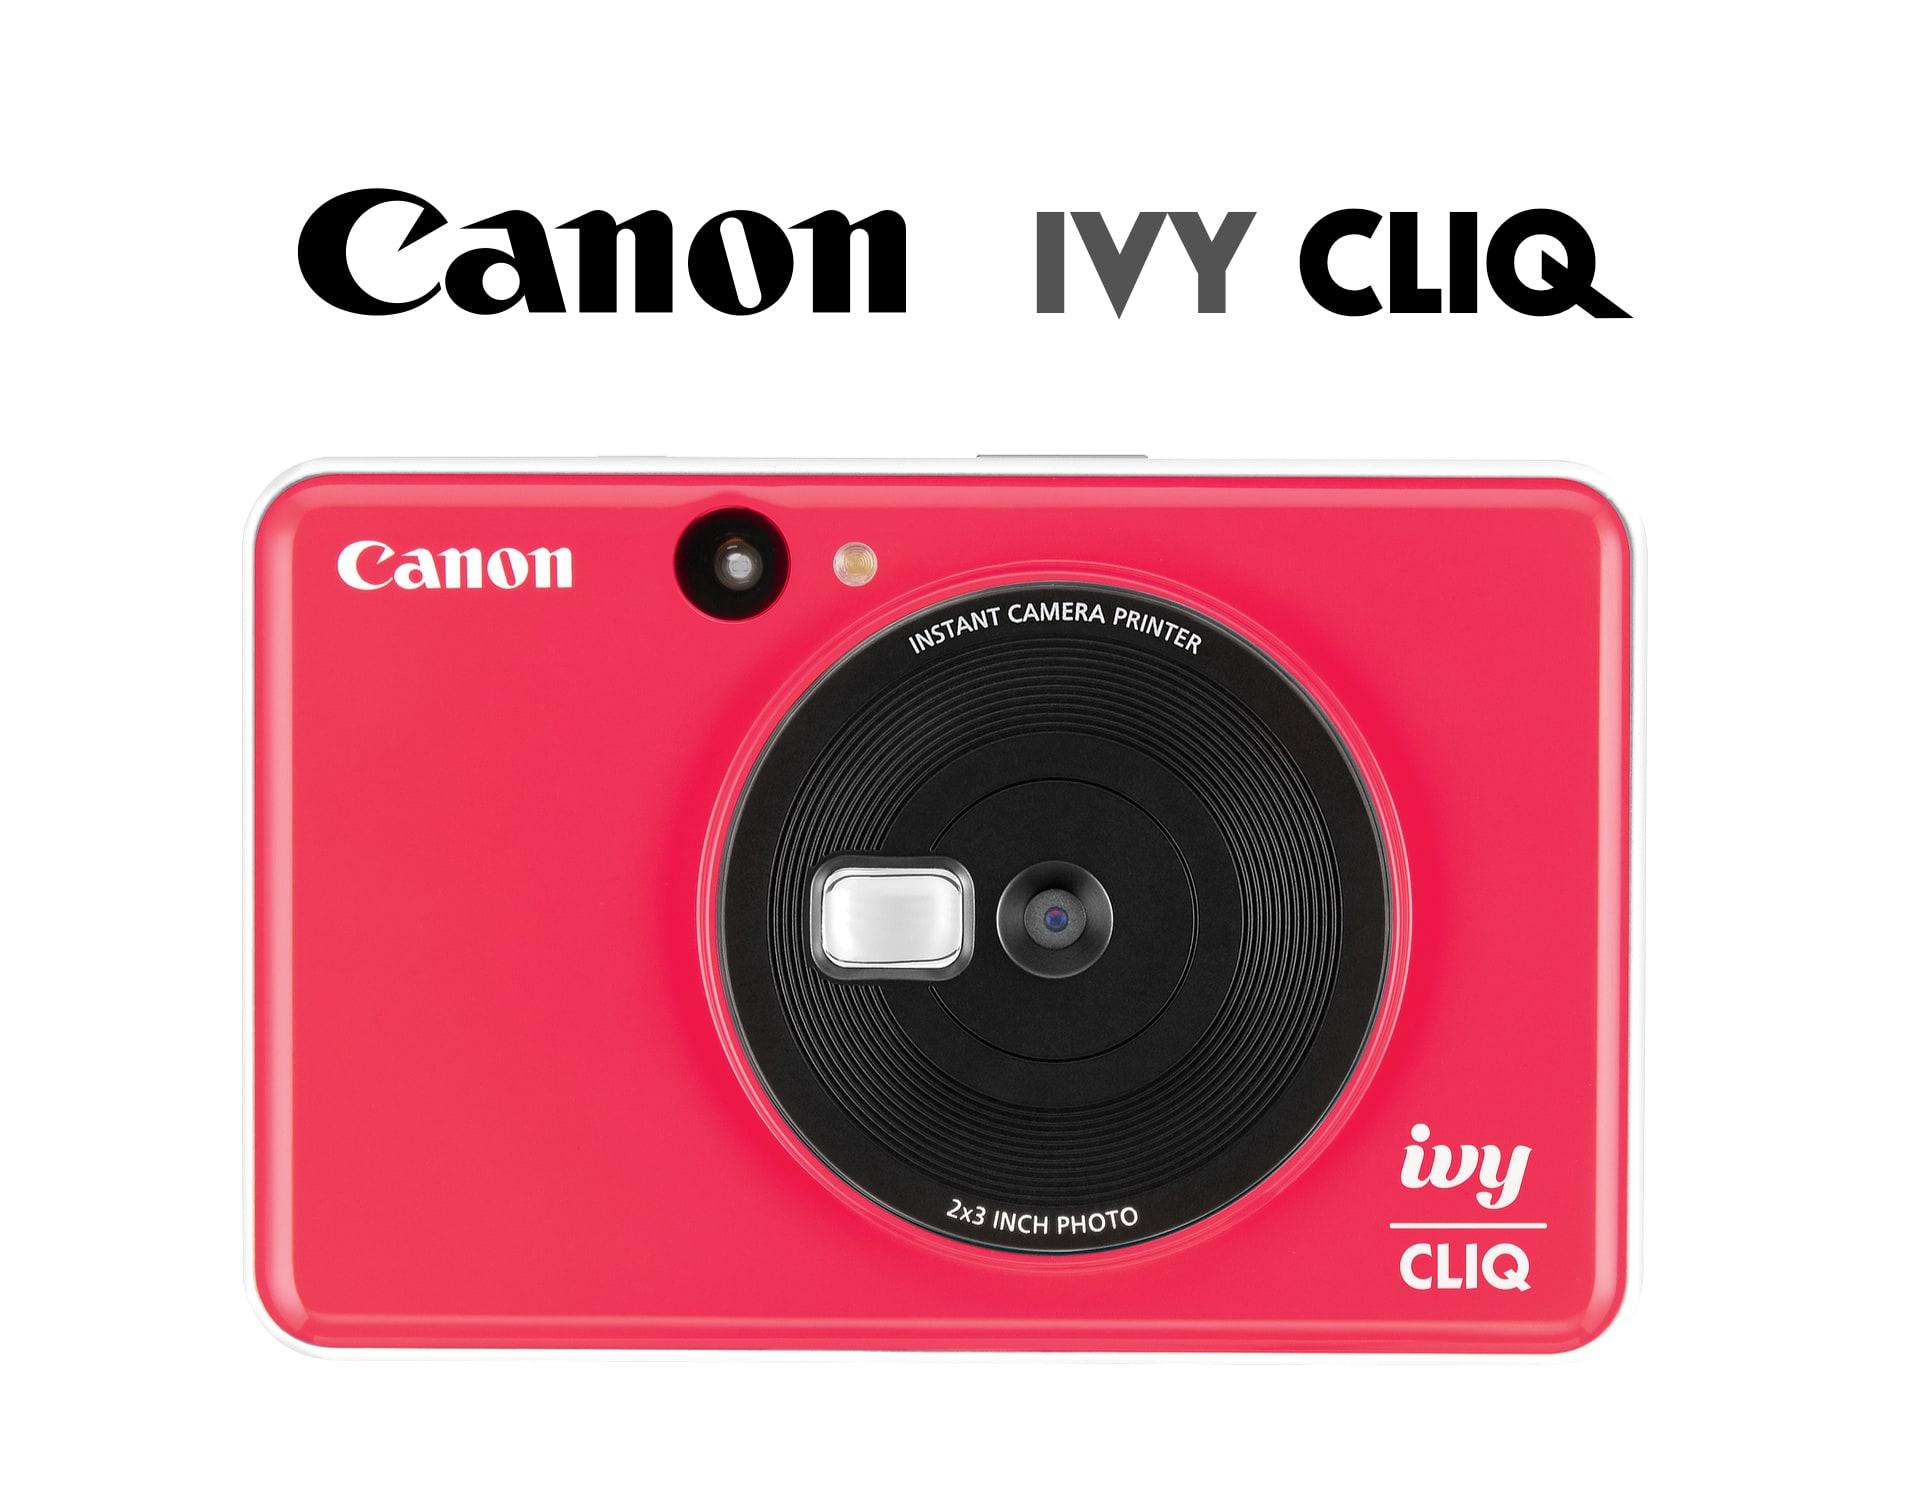 Canon IVY CLIQ hybrid instant photo camera